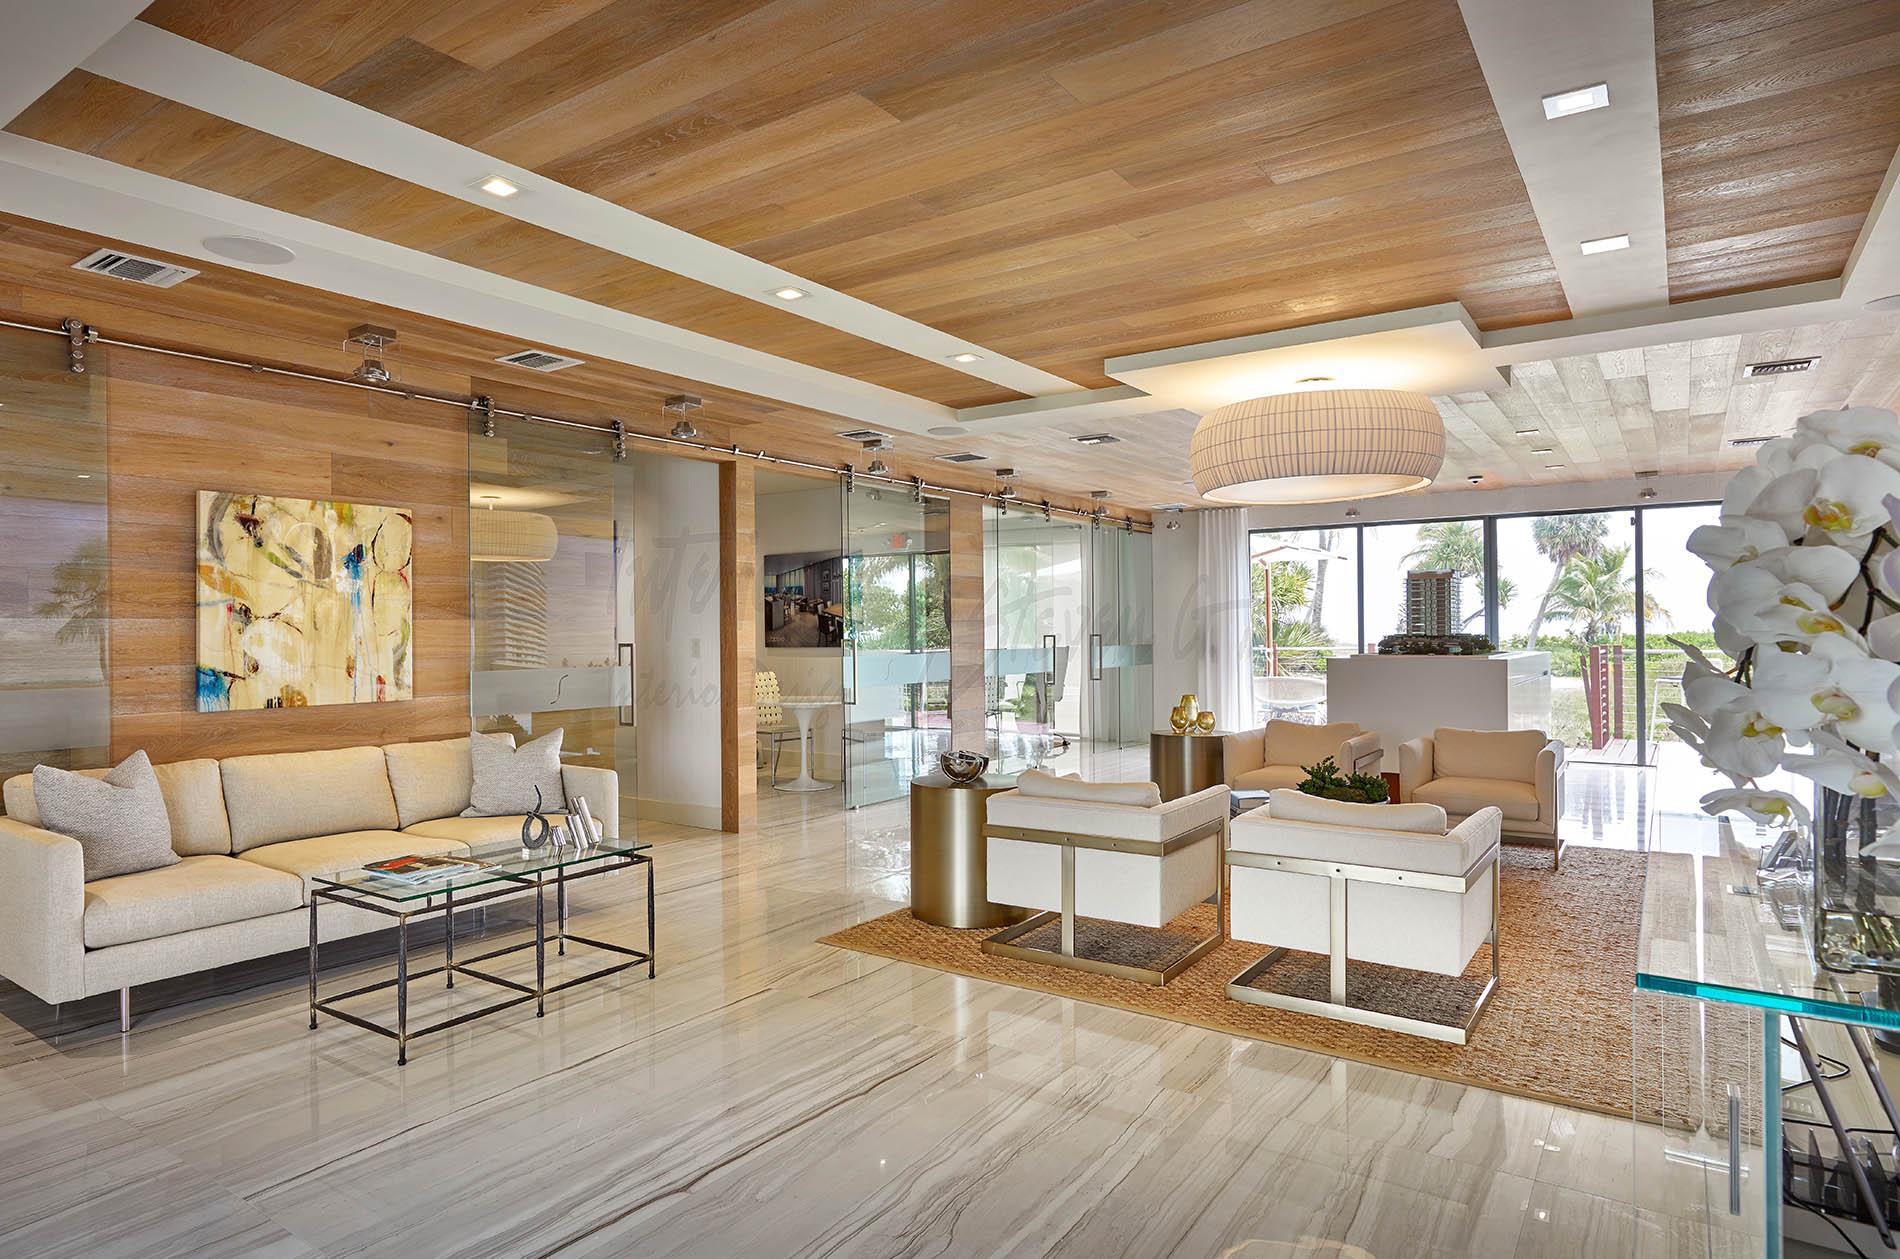 Sabbia beach design portfolio interiors by steven g for Steven g interior designs